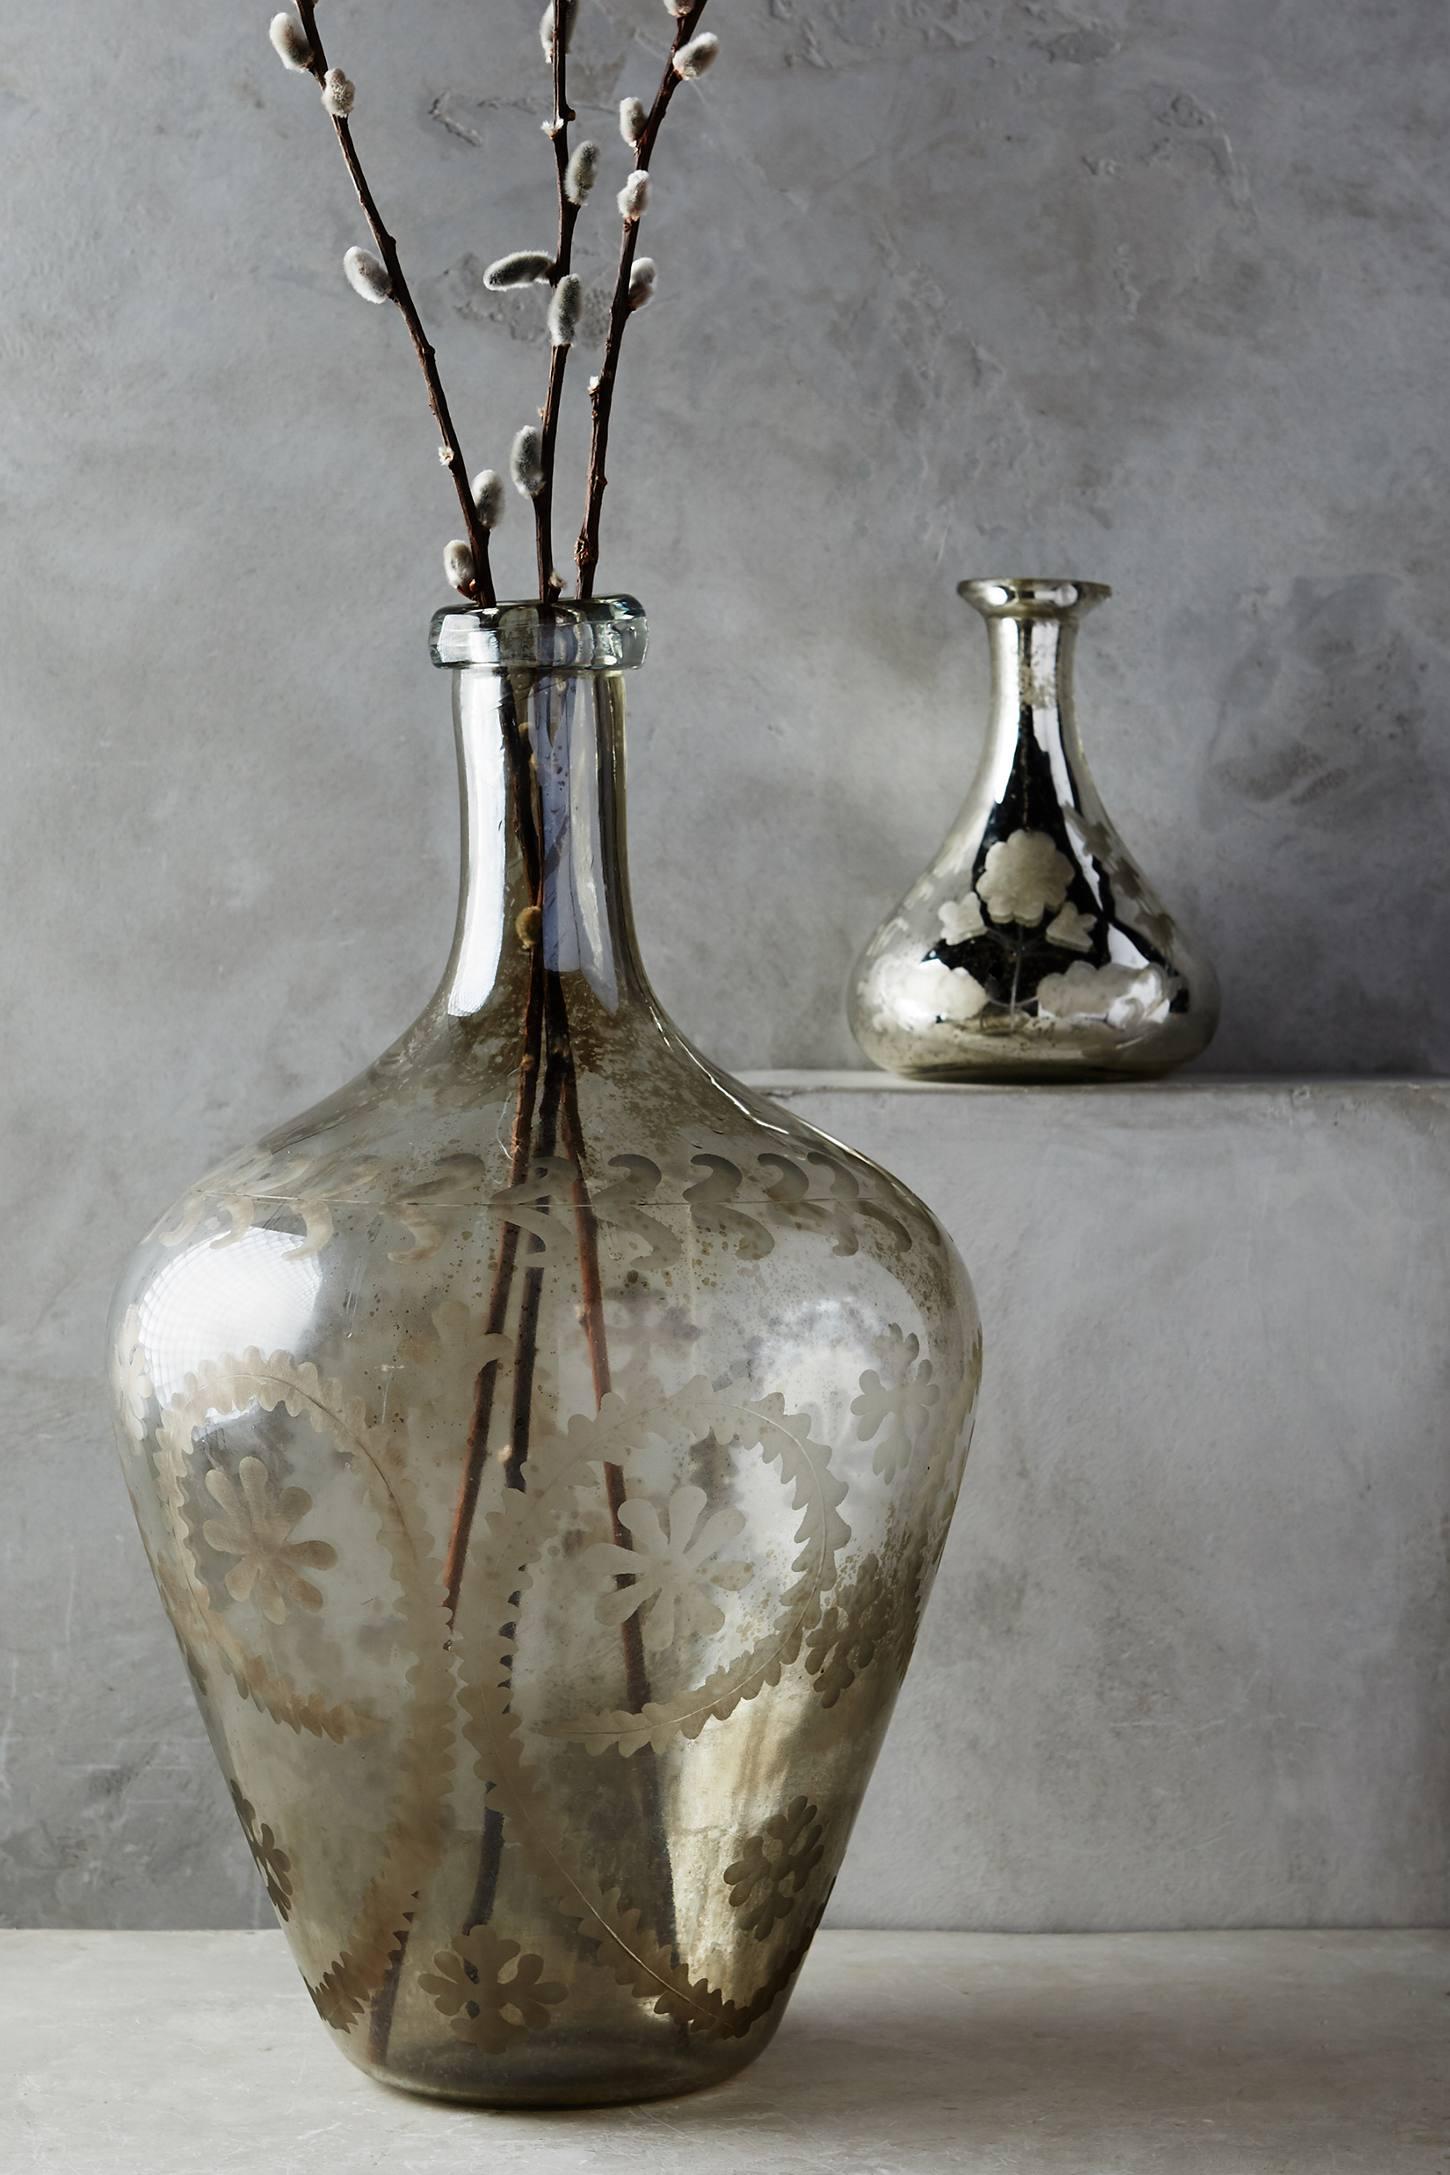 Moonshod Mercury Vase